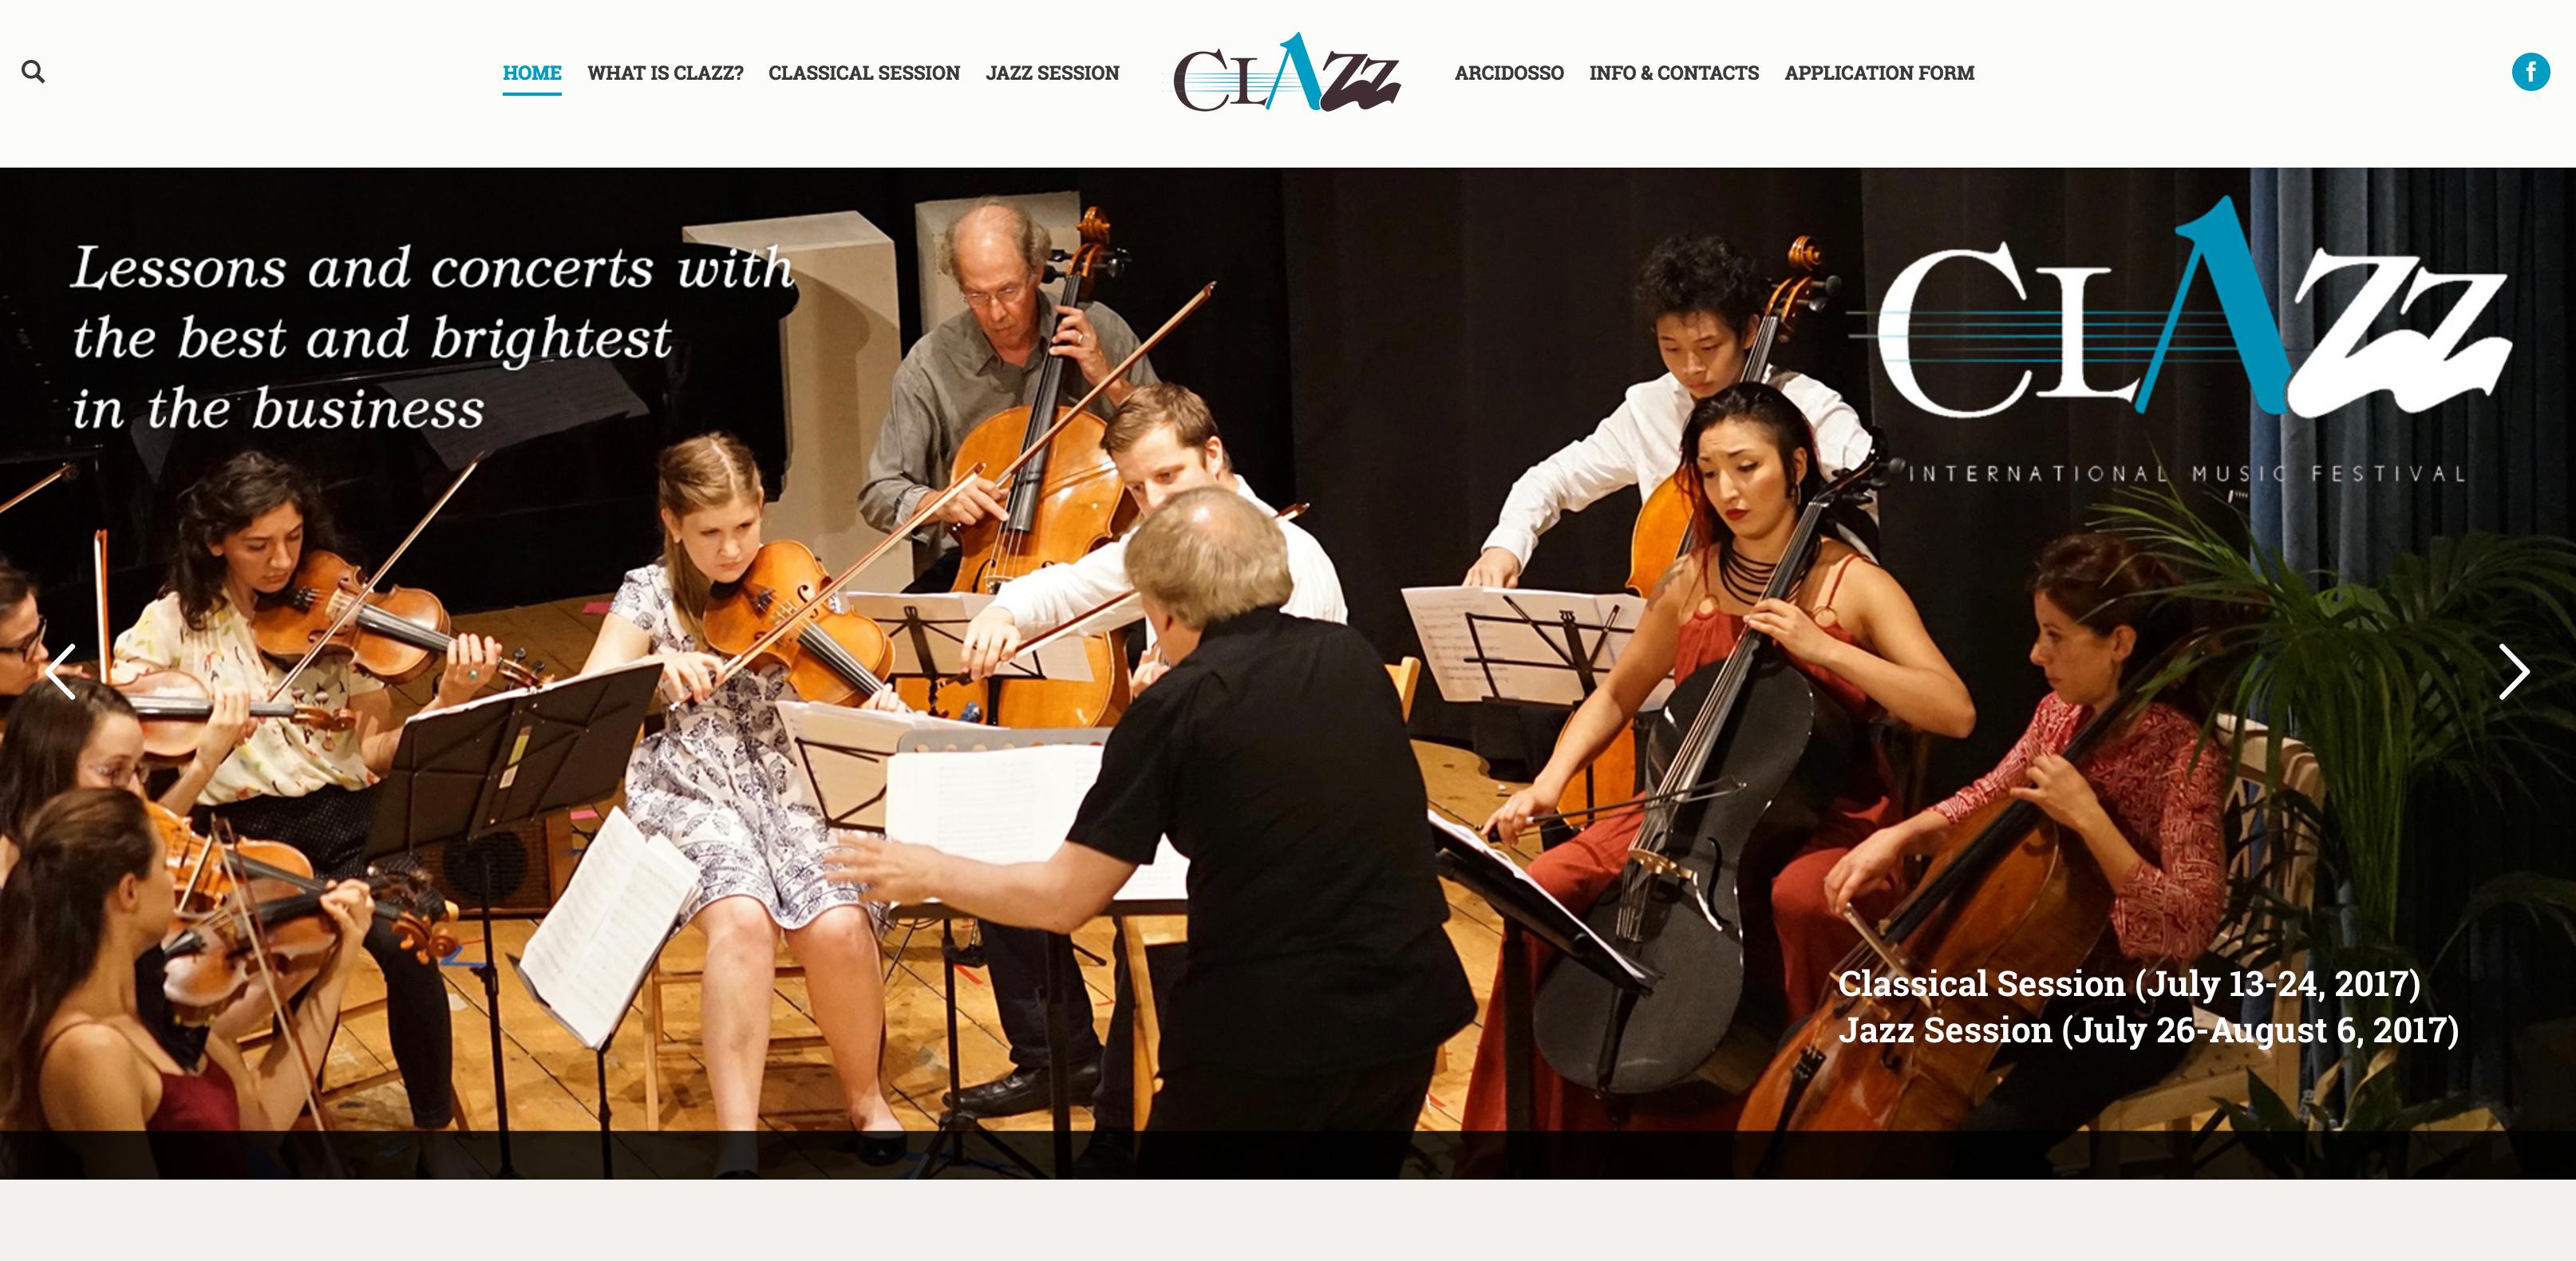 Clazz International Music Festival